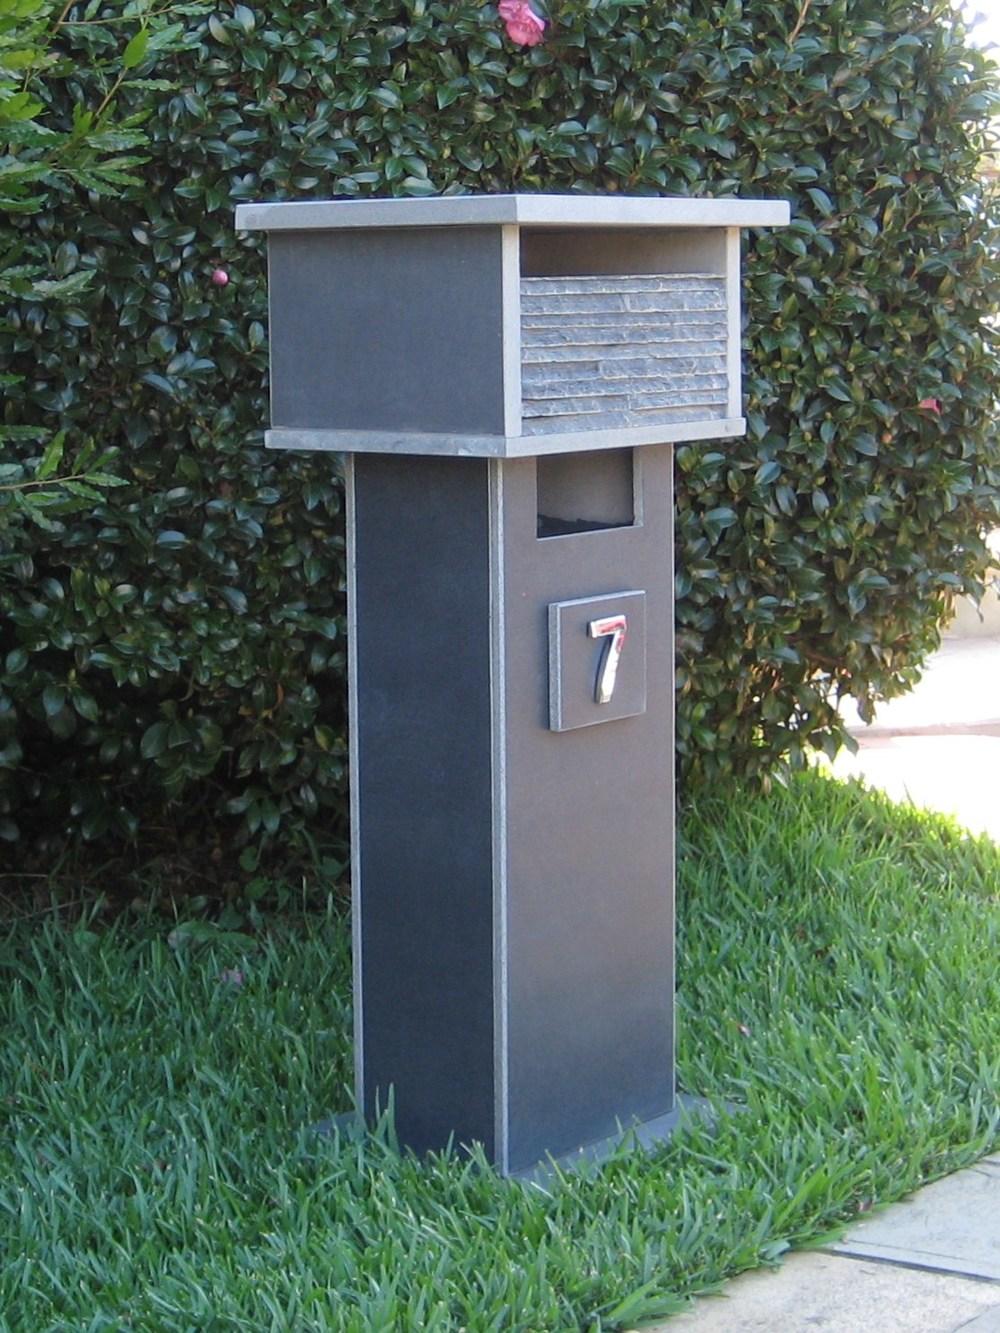 7. Bluestone letterbox solid, aluminium back door with 2 key lock 860cm high top part mesure 300mm x 400mm. $473